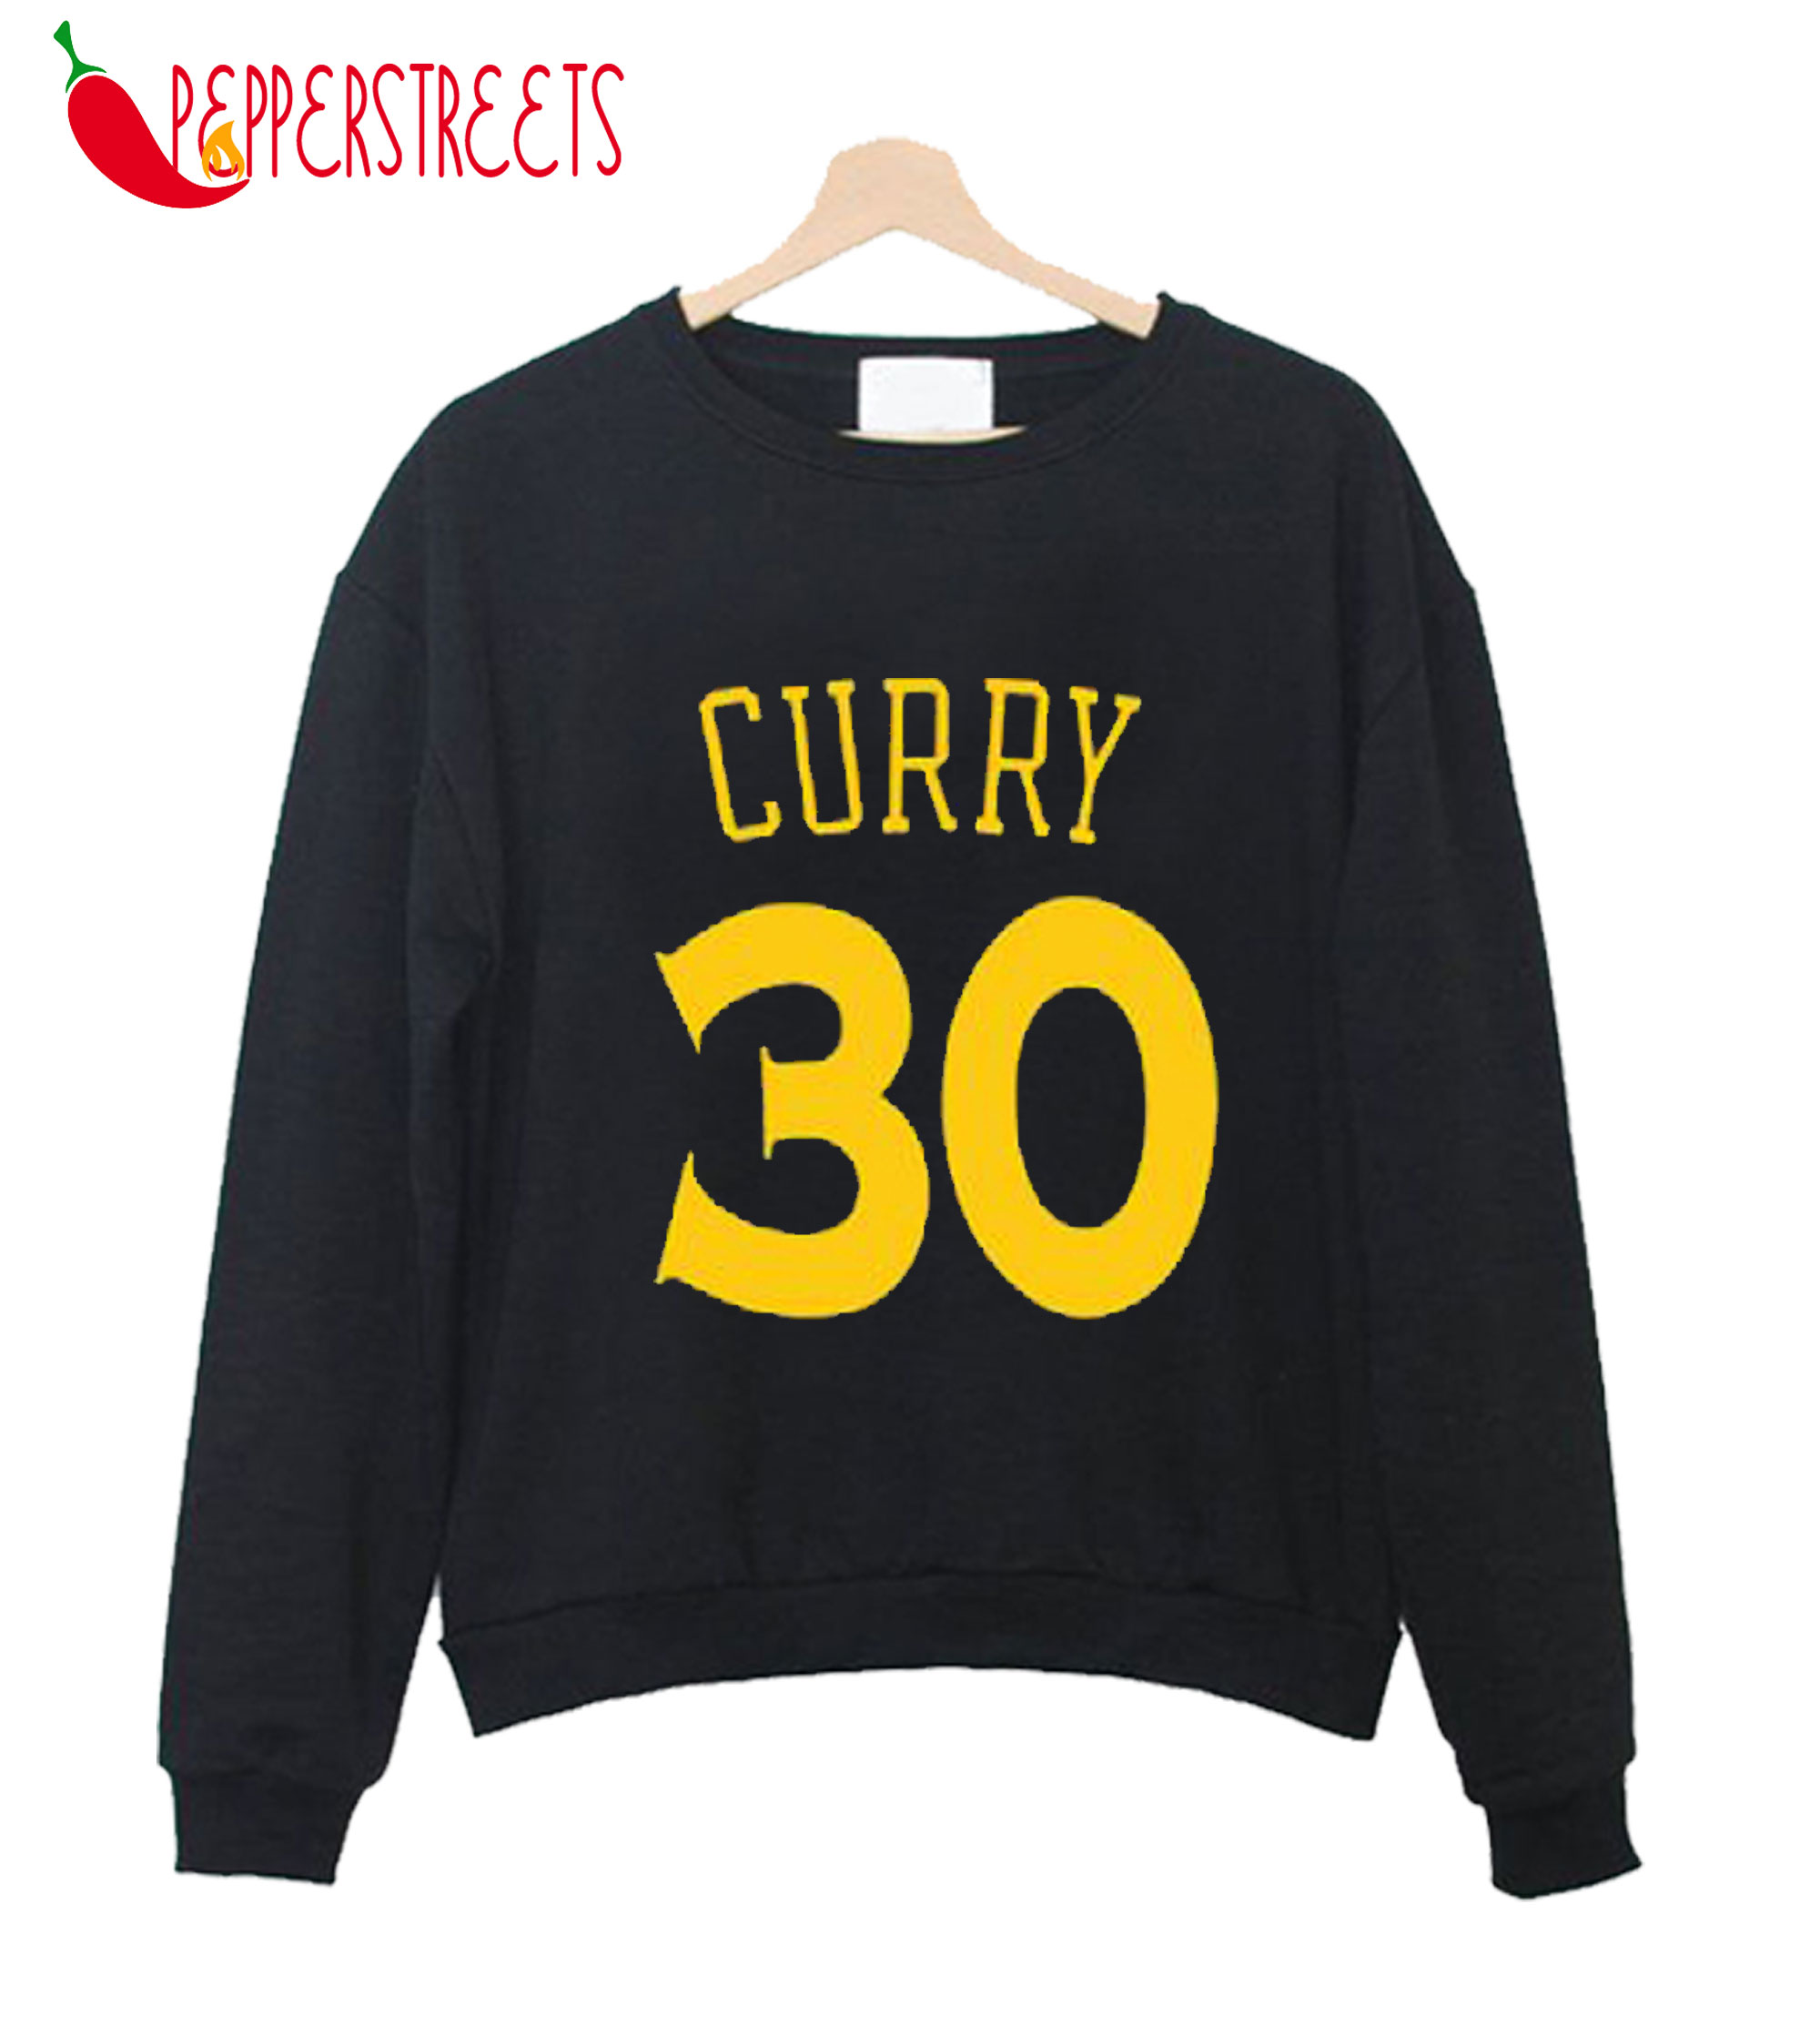 Stephen Curry 30 Sweatshirt